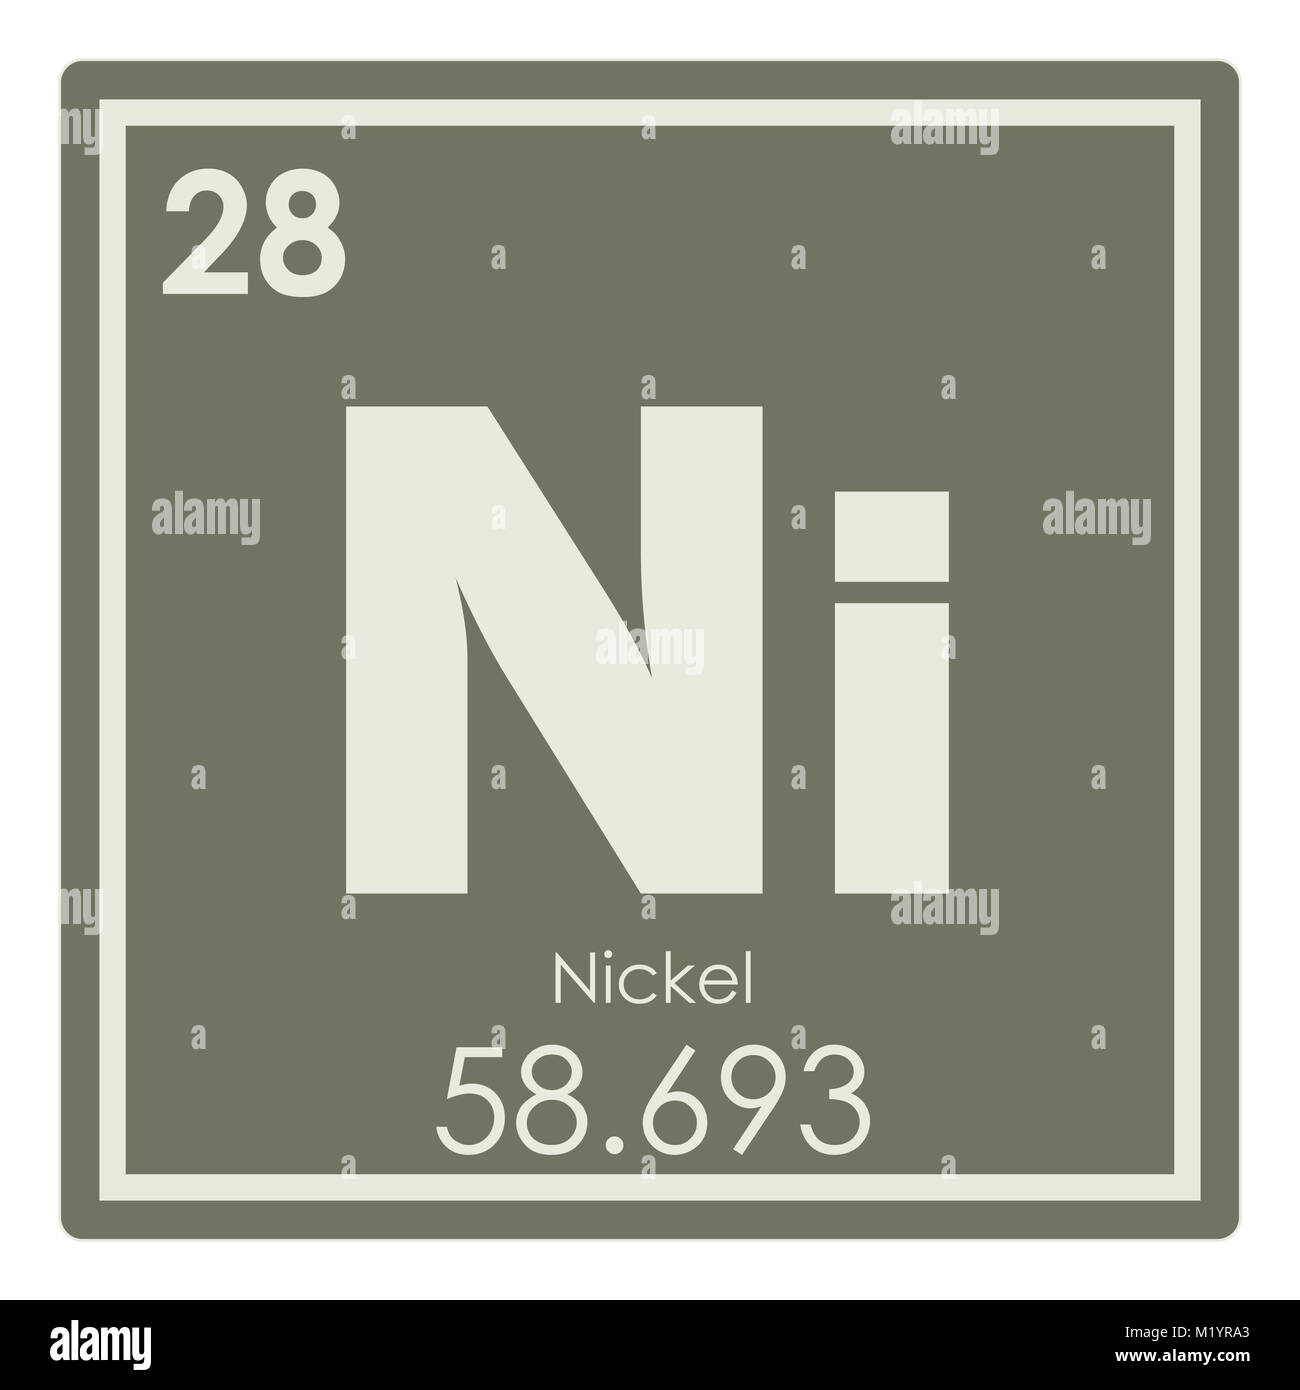 Nickel Chemical Element Stock Photos Nickel Chemical Element Stock